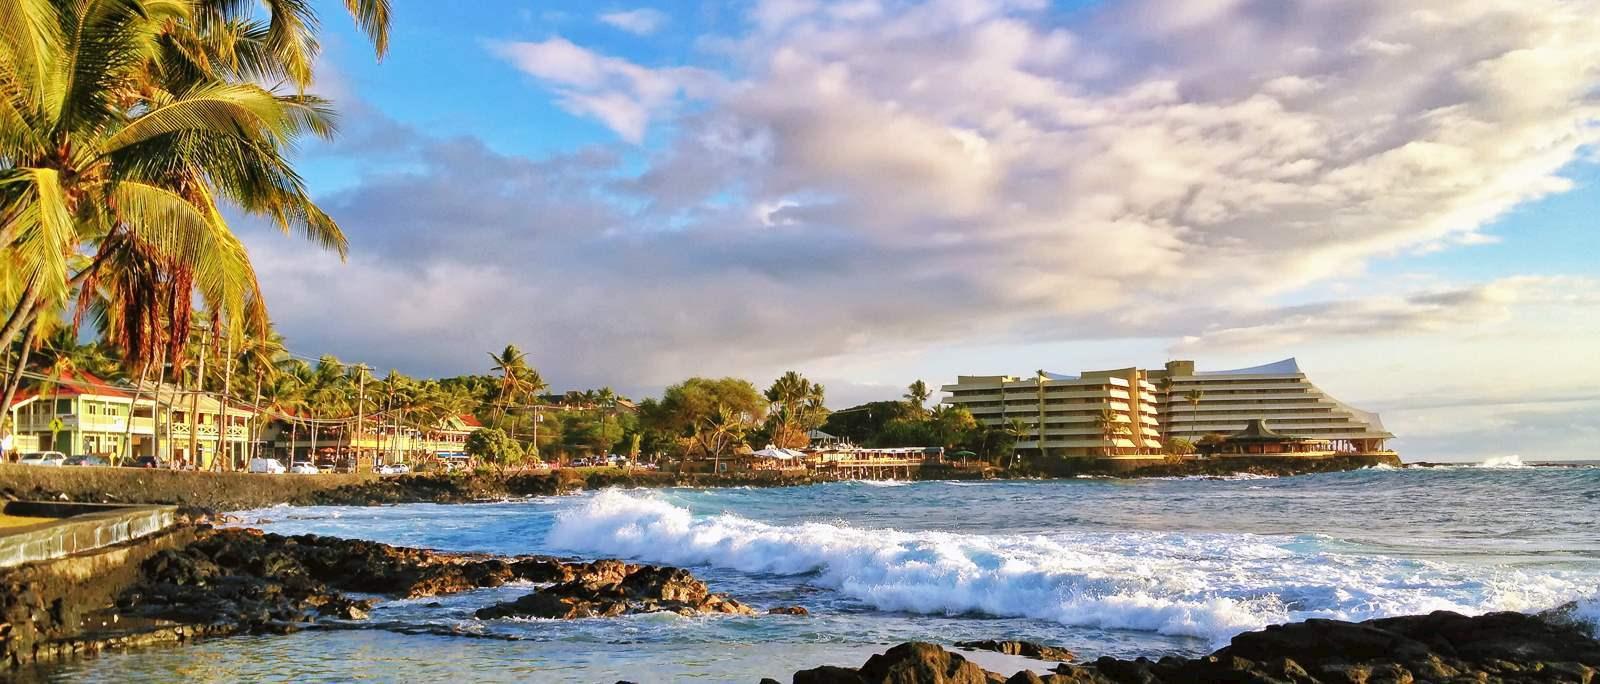 Discover of Royal Kona Resort, Hawaii